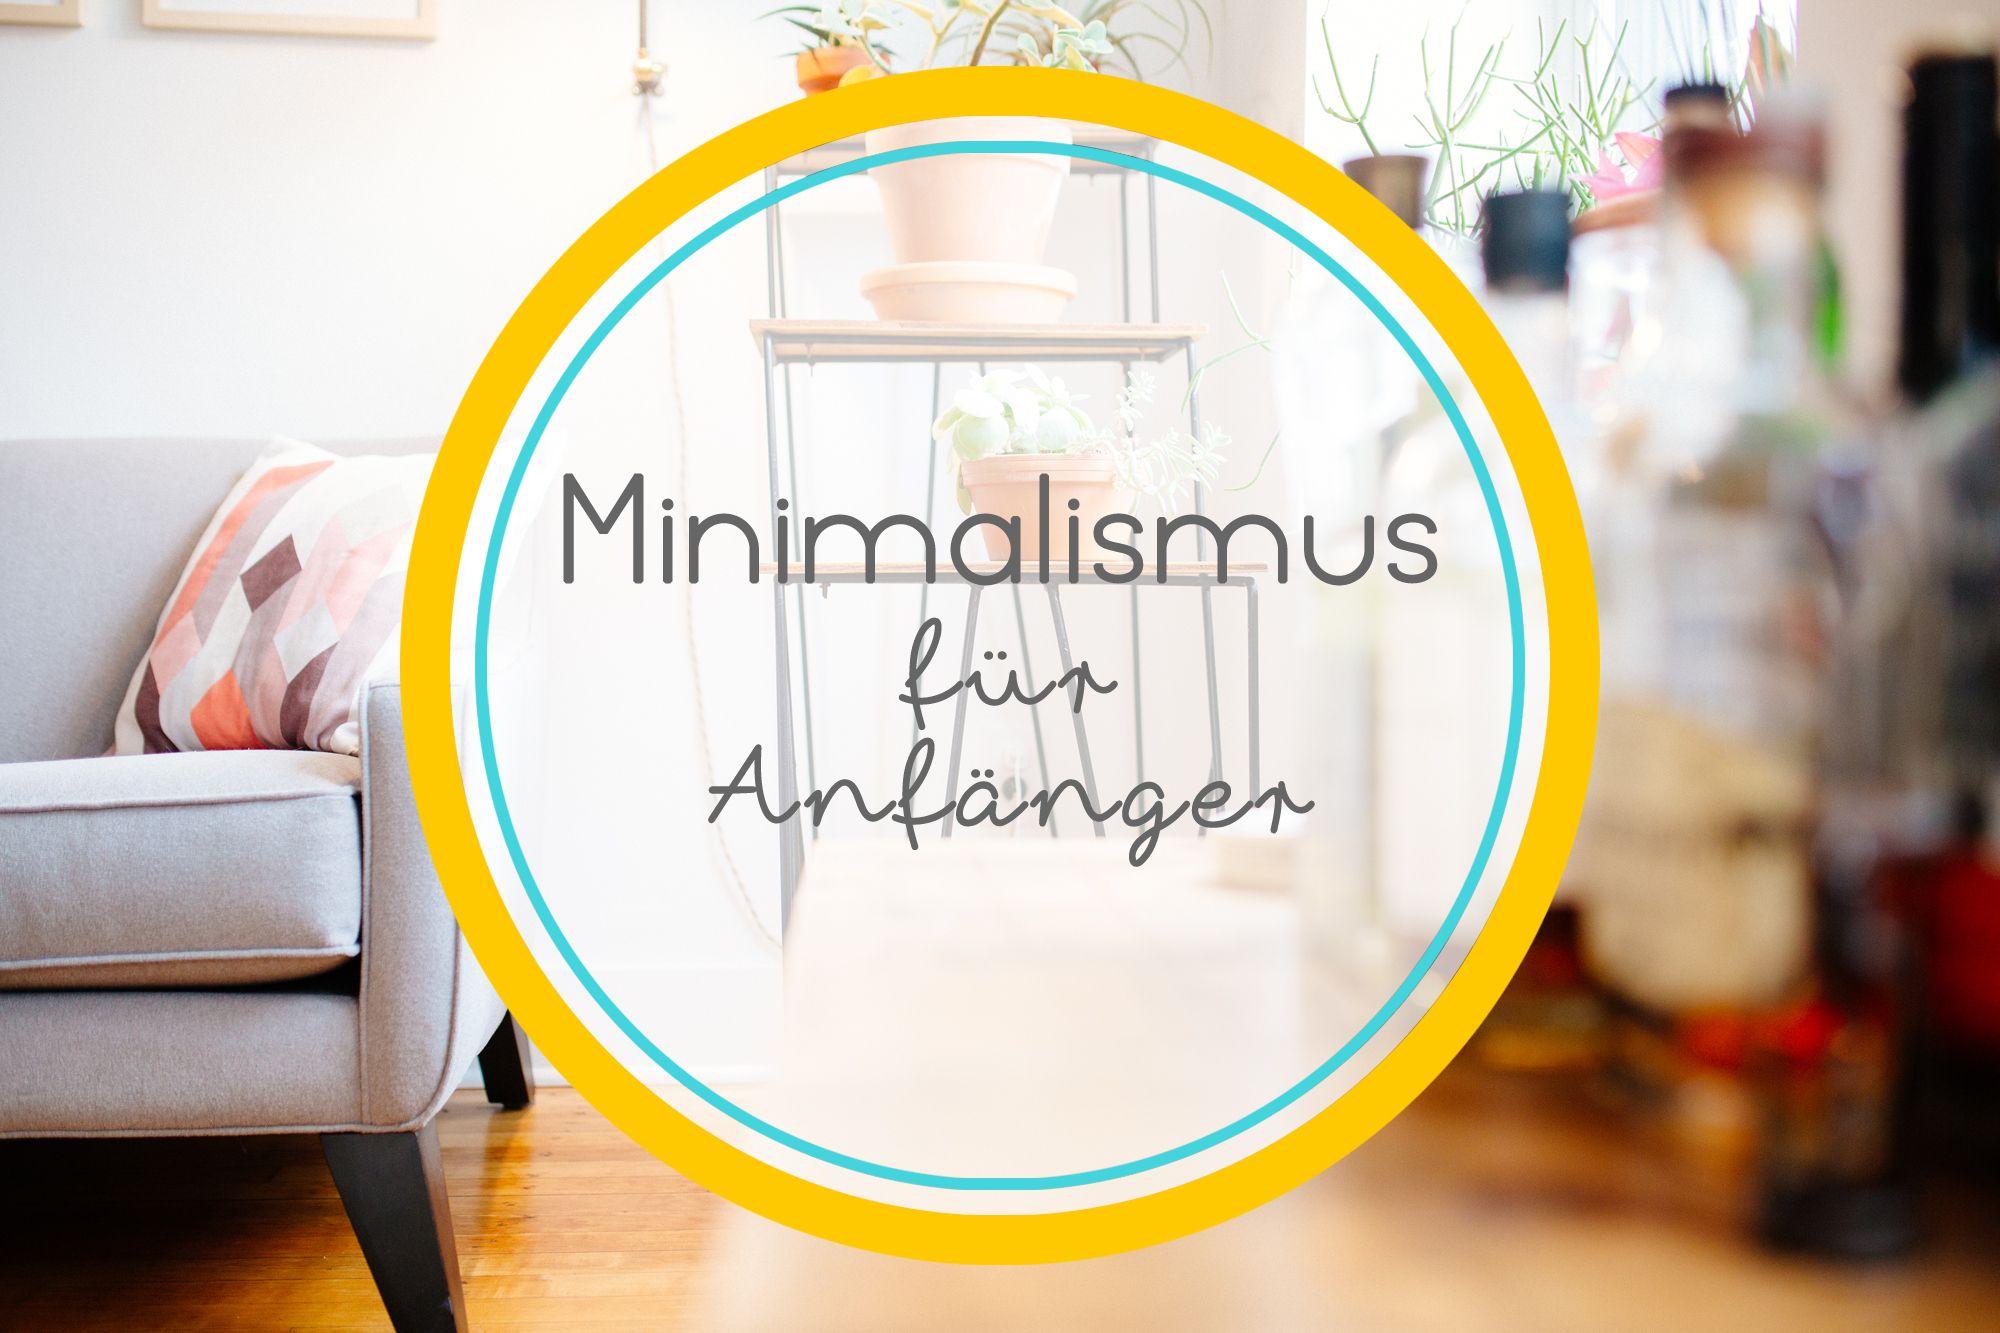 open mind mag minimalismus f r anf nger entr mpel dein leben pers nliche entwicklung. Black Bedroom Furniture Sets. Home Design Ideas